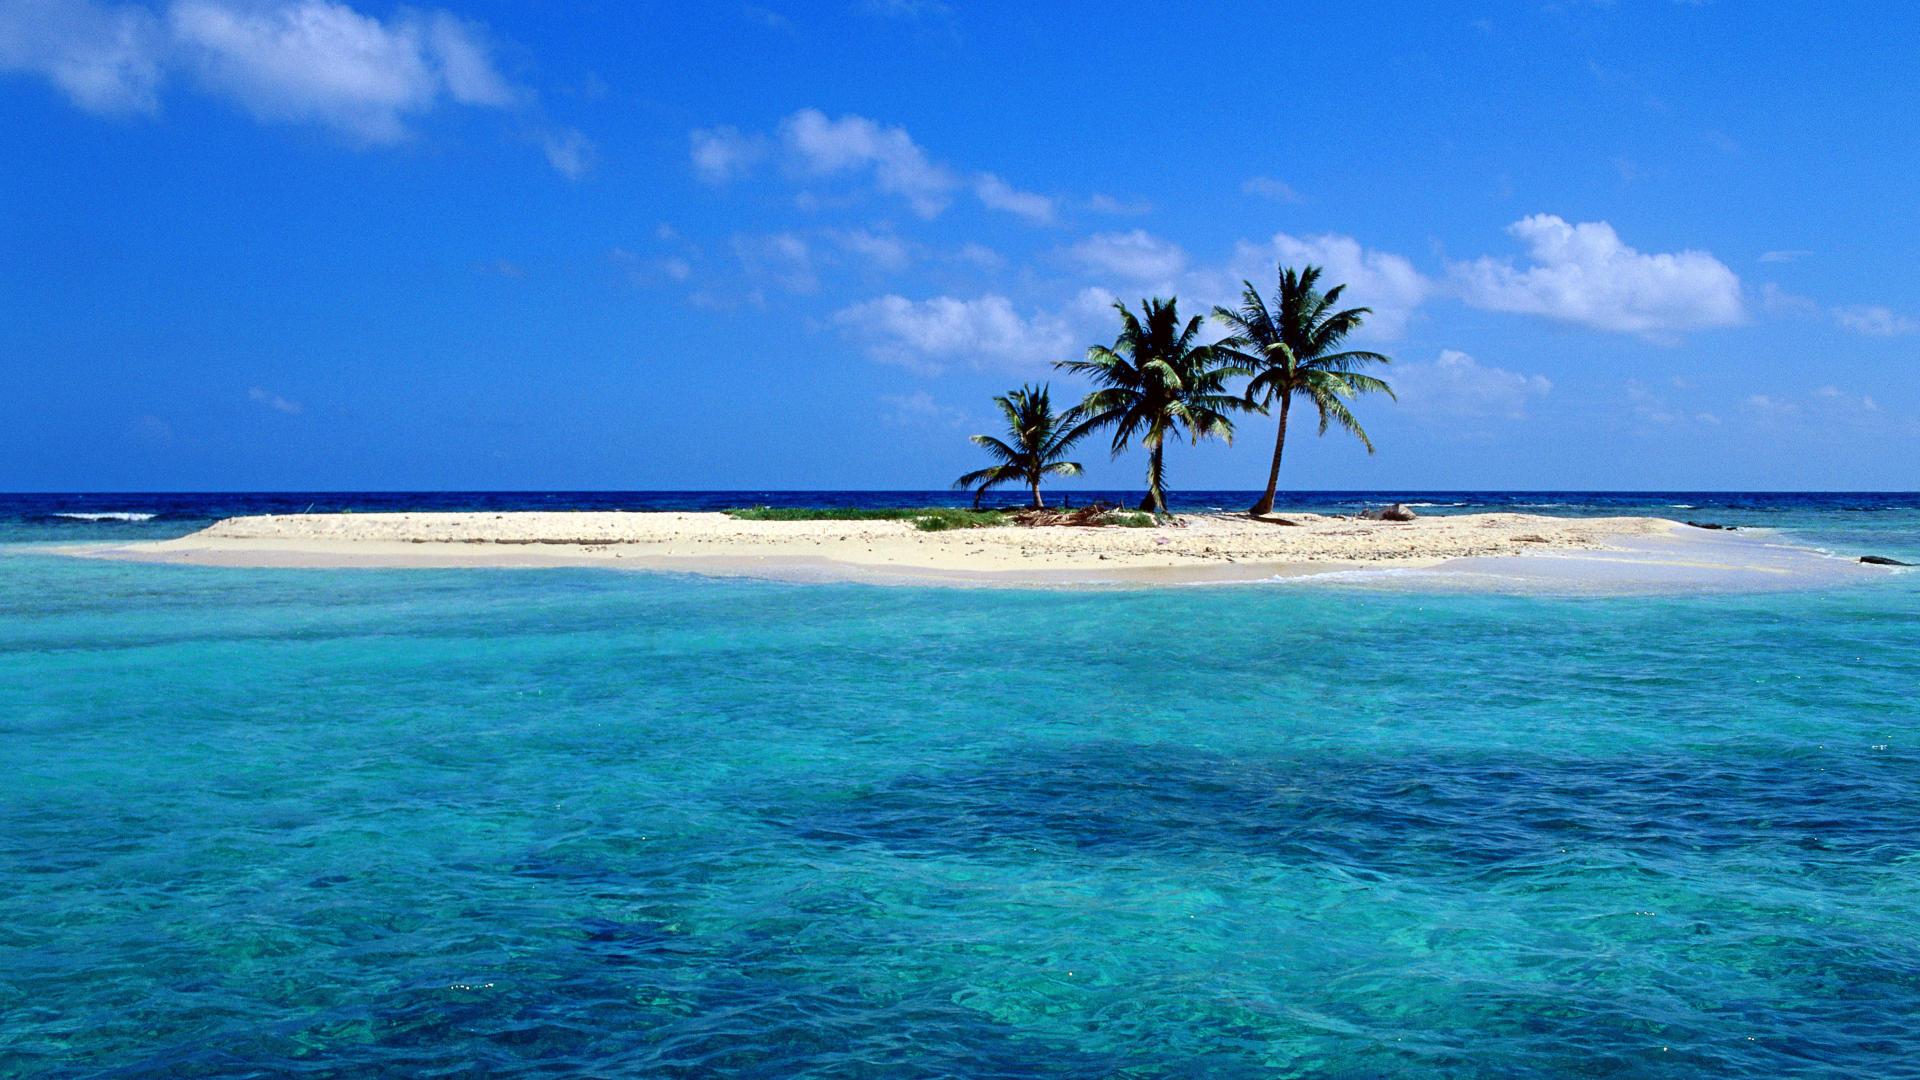 backgrounds desktop belize wallpaper island sandy beach 1920x1080